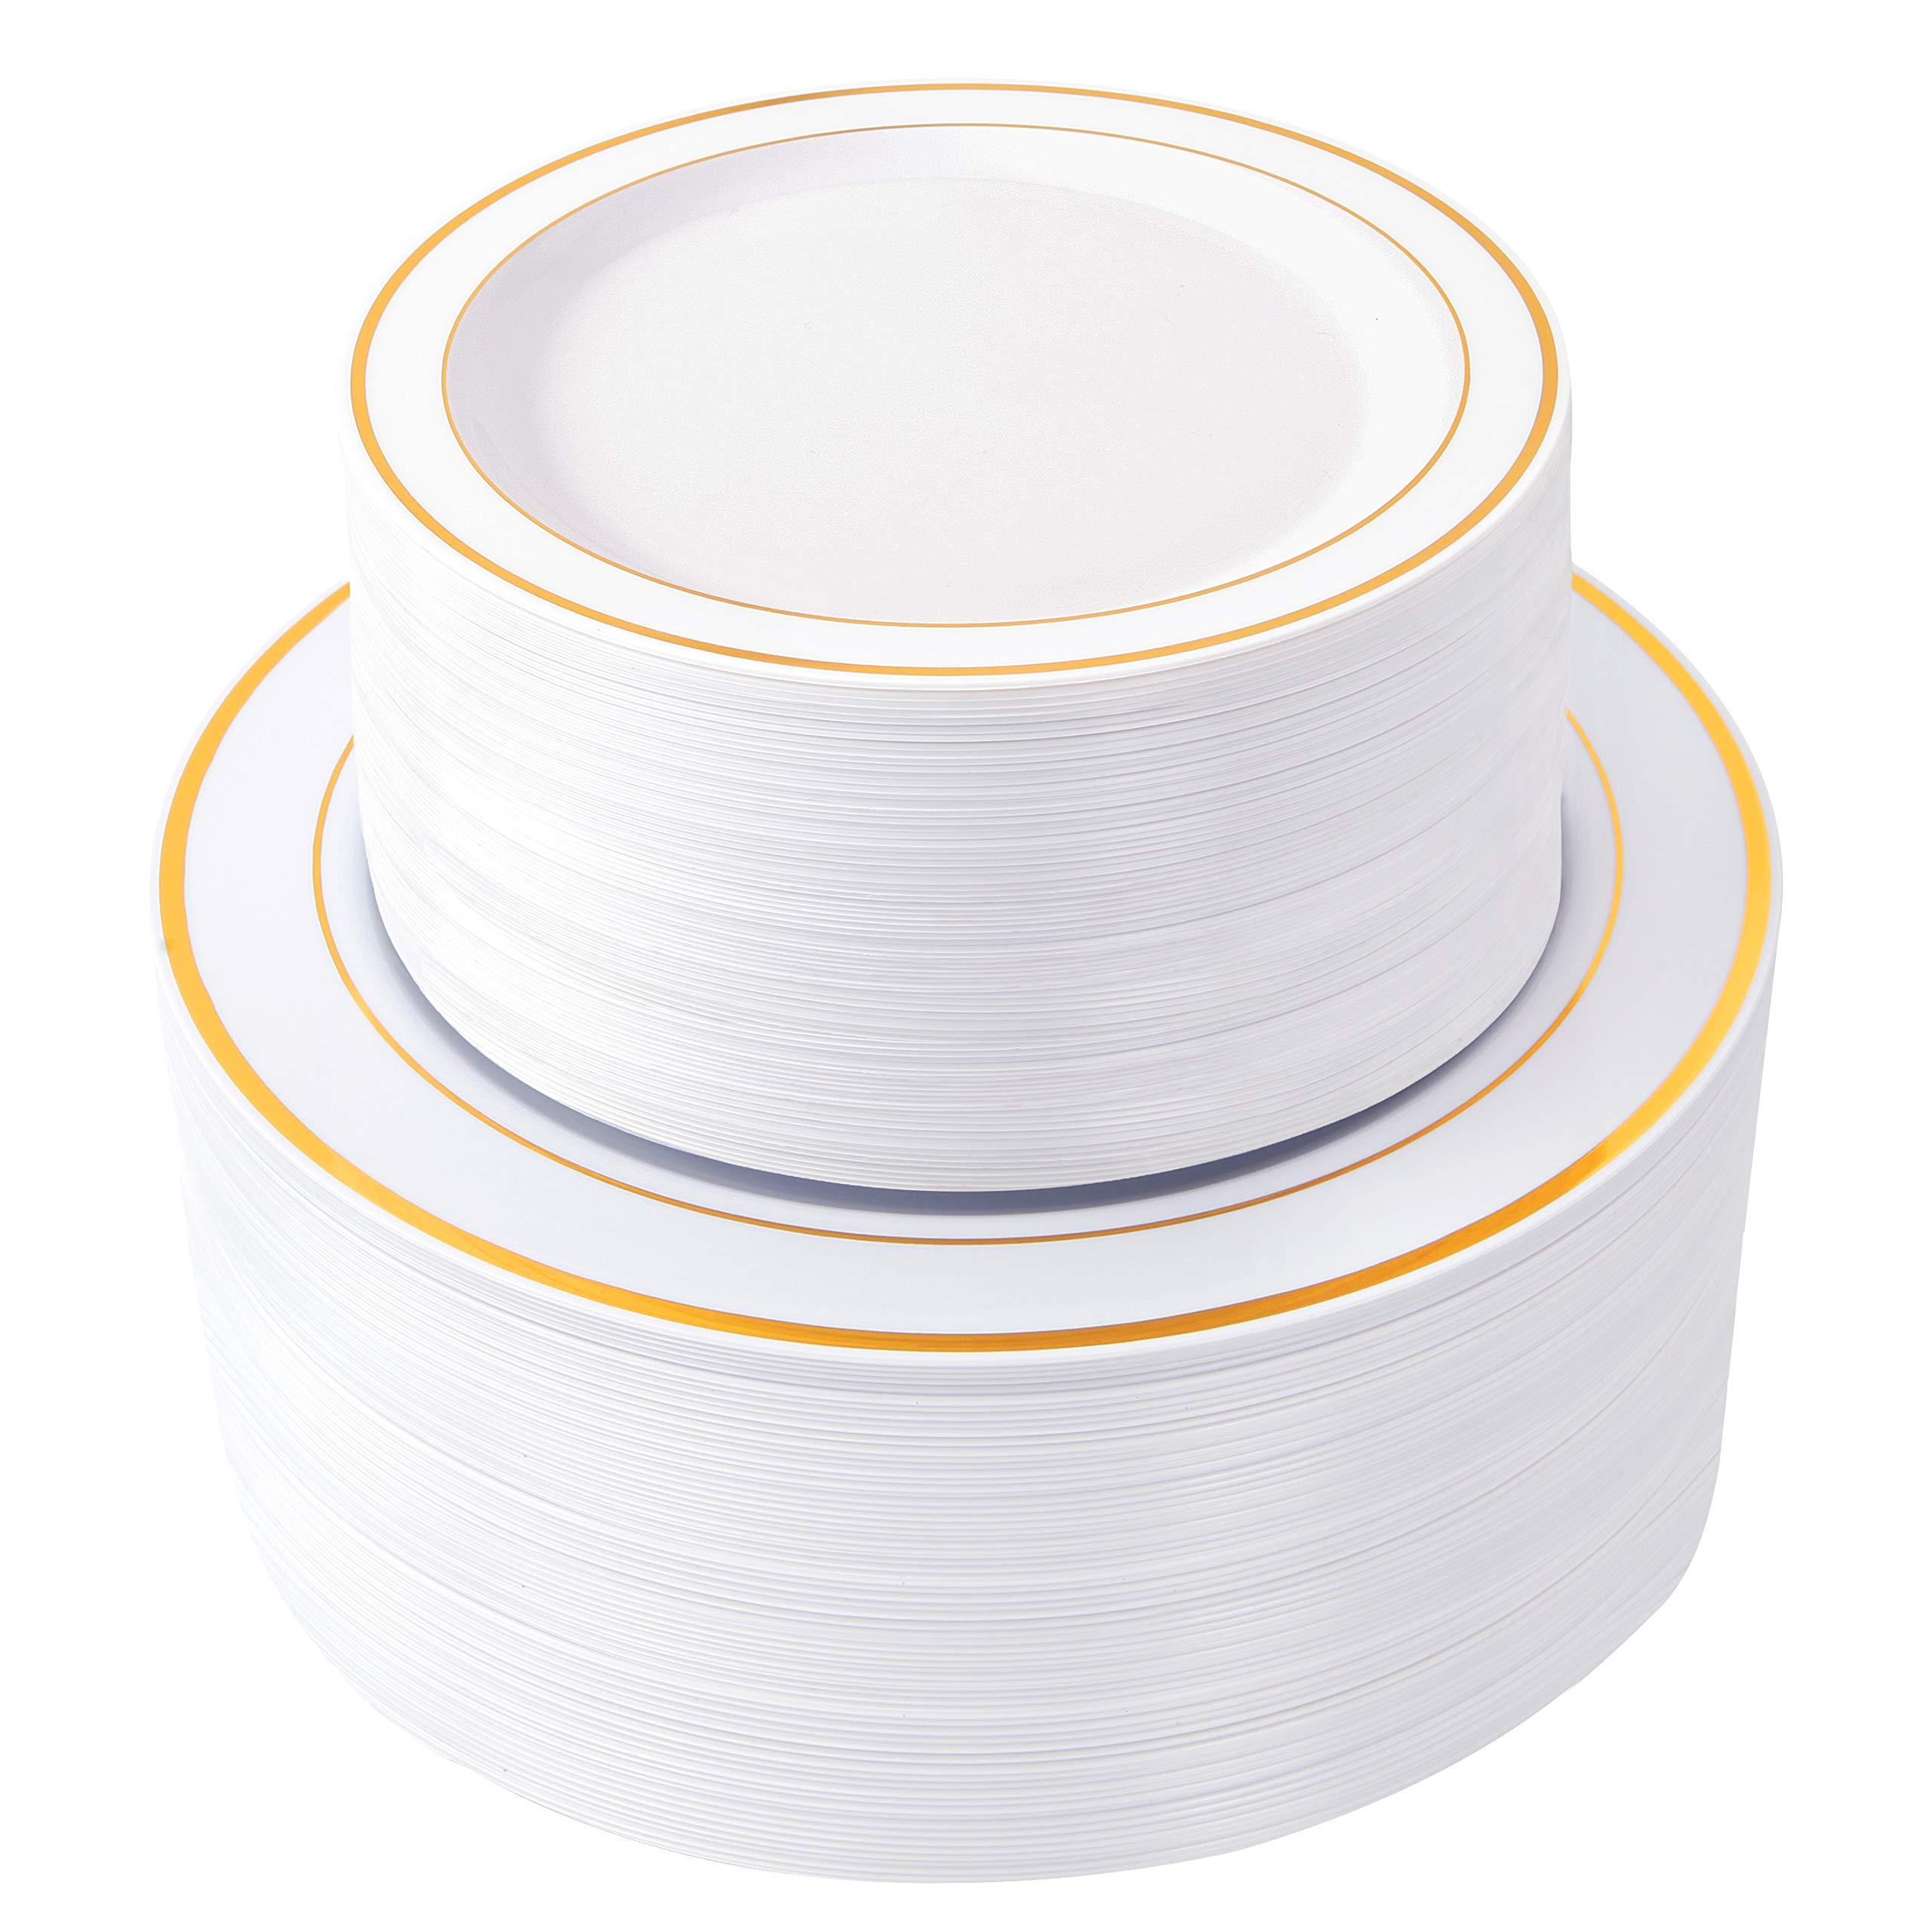 WDF 120 pieces Gold Disposable Plastic Plates- Gold Rim Wedding Party Plates,Premium Heavy Duty 60-10.25'' Dinner Plates and 60-7.5'' Salad Plates Combo (Gold Plates)